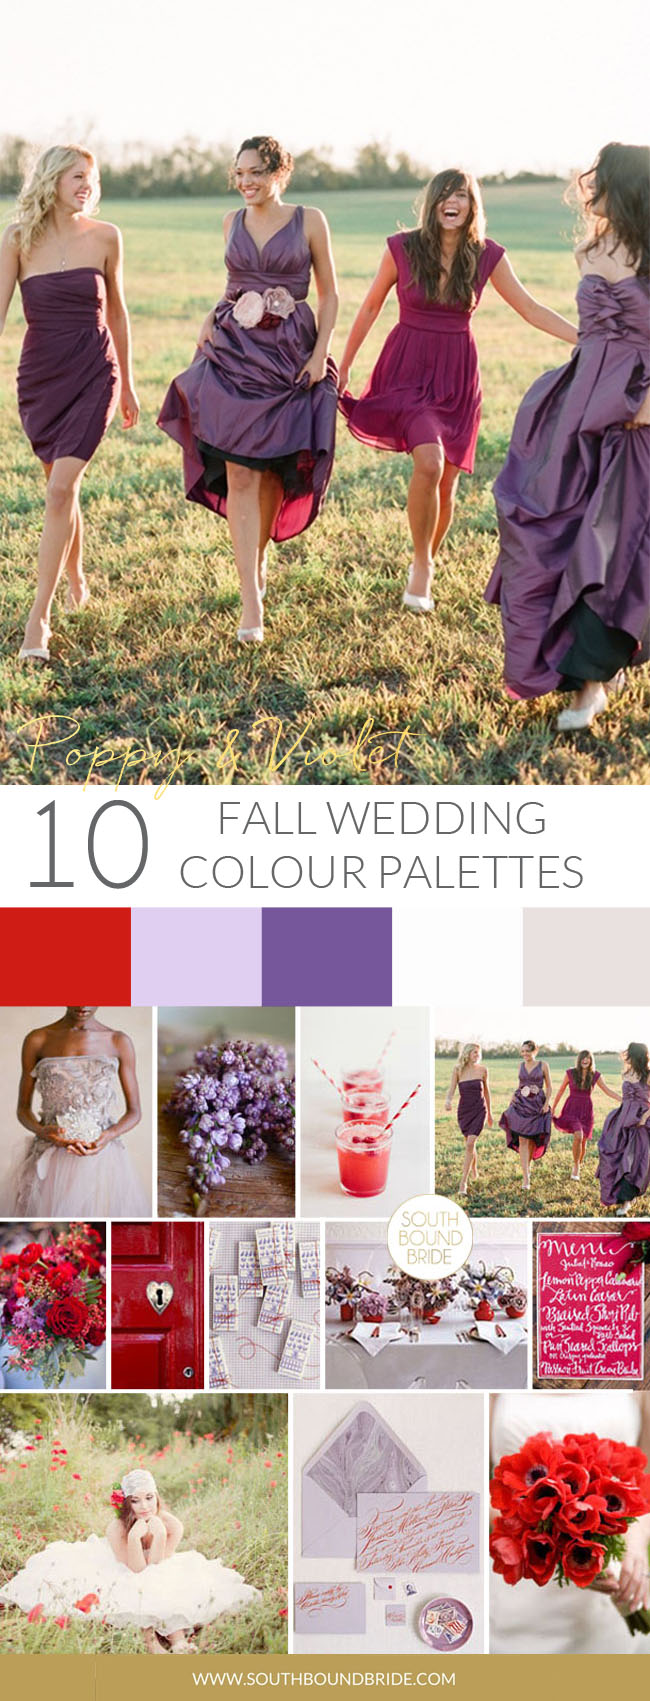 Poppy & Violet Fall Wedding Palette | SouthBound Bride